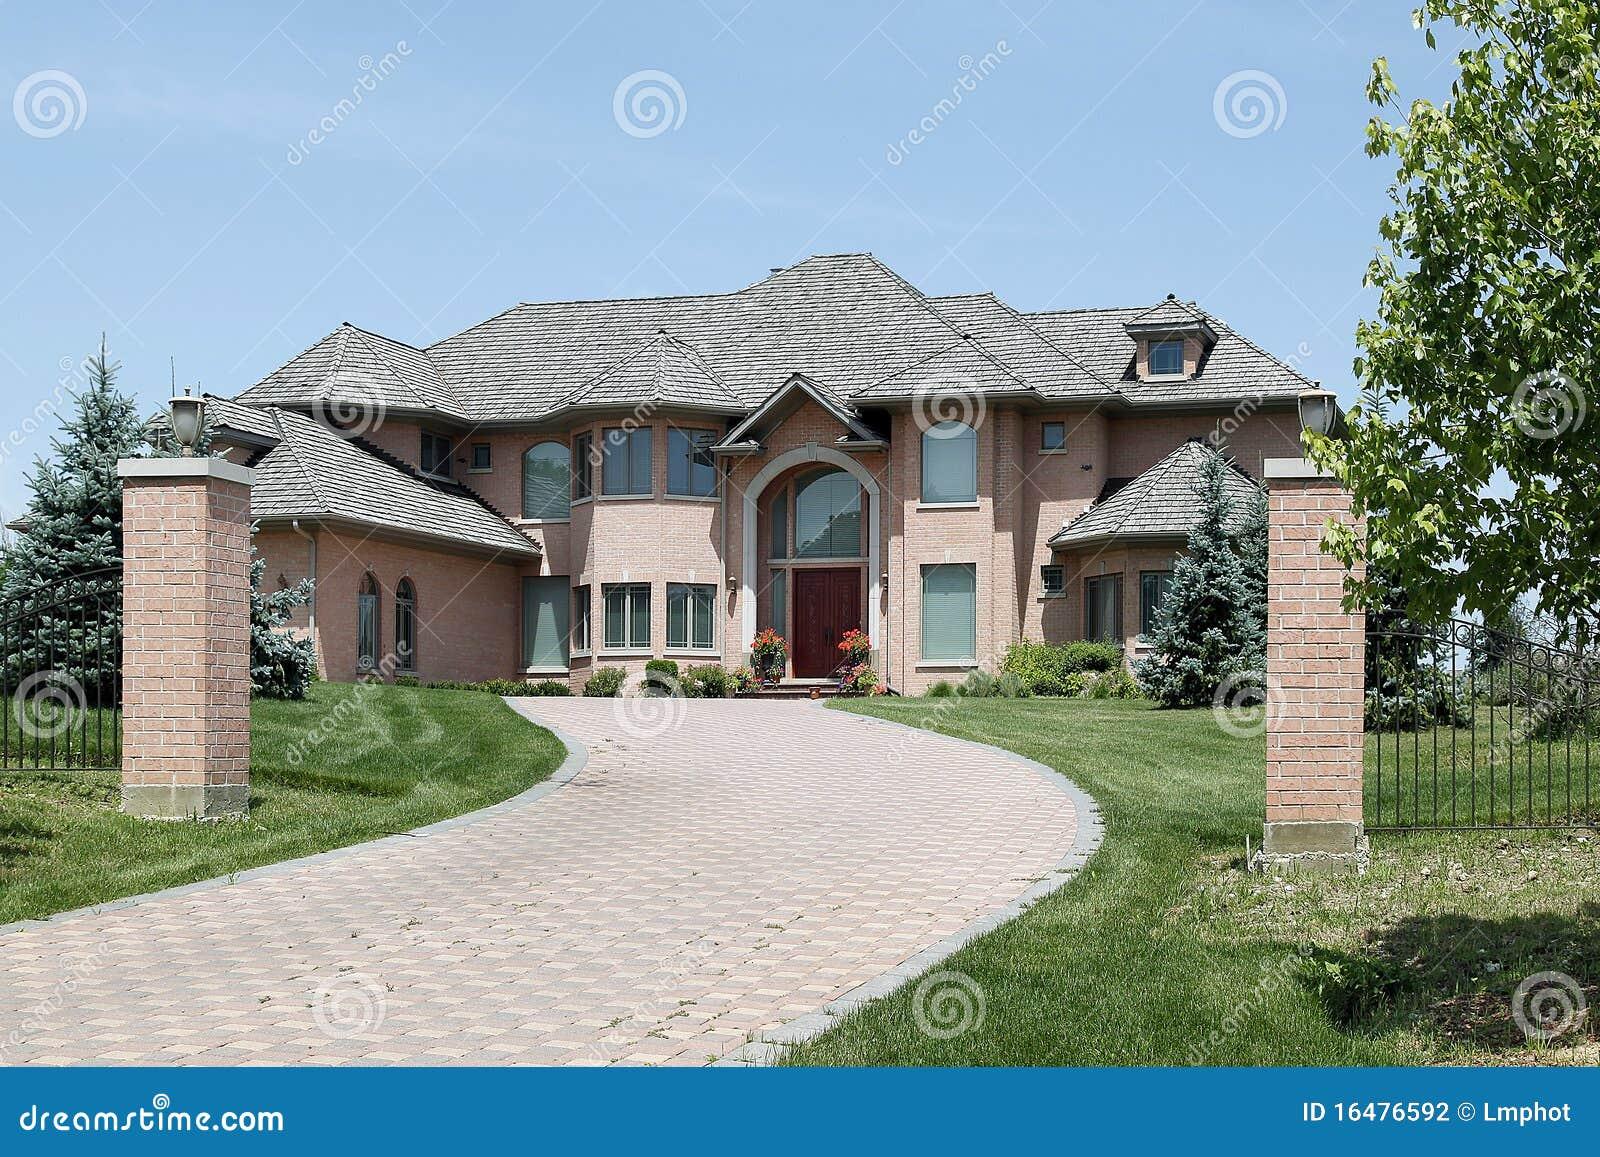 Luxury Brick Home With Pillars Stock Photography Image